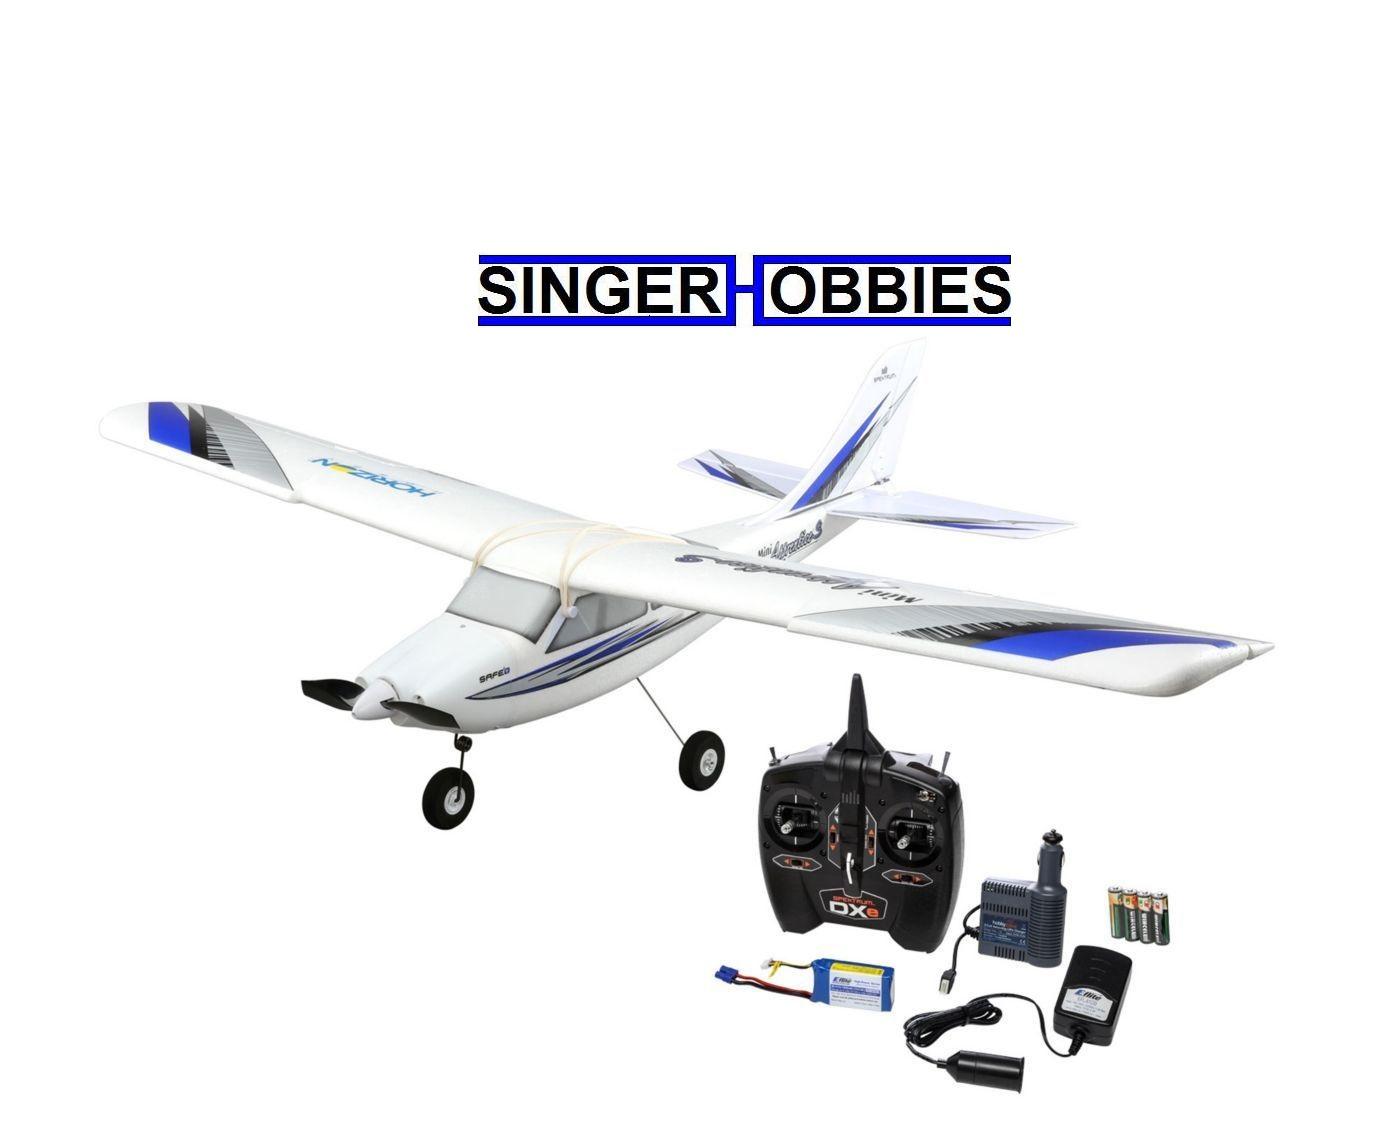 Hobbyzone Mini Apprentice S Rtf Radio Control Airplane W